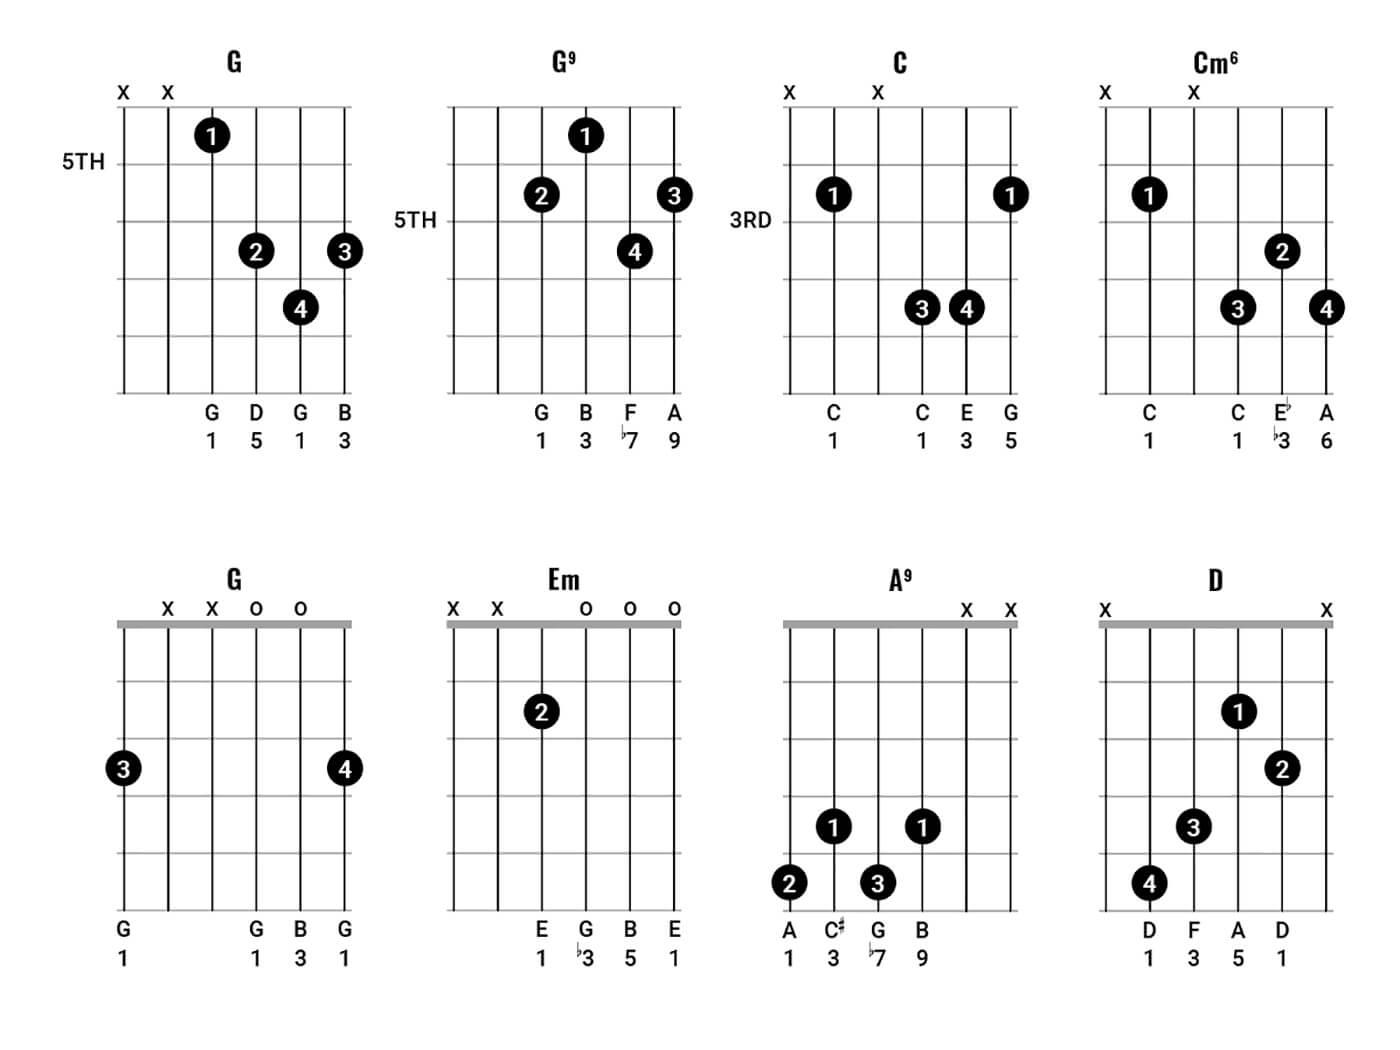 Figure 3: Vocal Backing